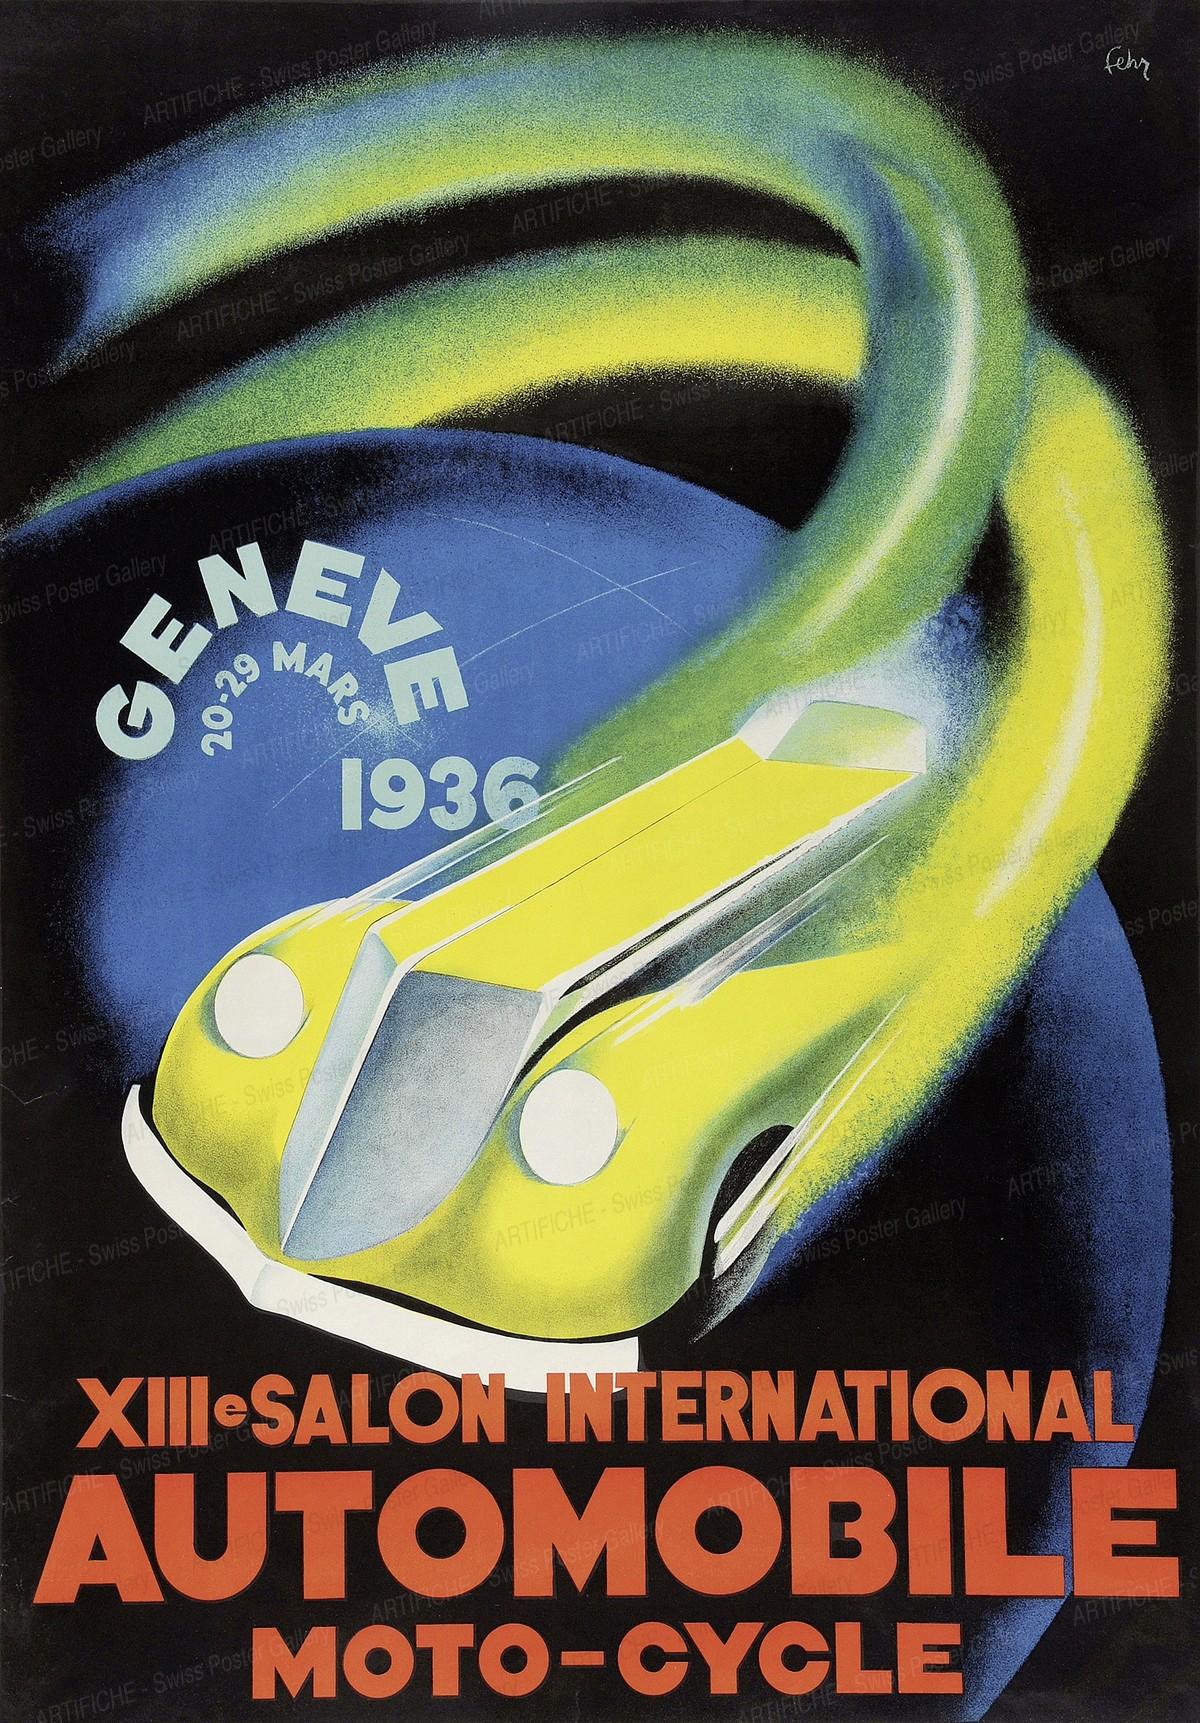 XIIIe Salon International AUTOMOBILE MOTO-CYCLE, Henri Fehr